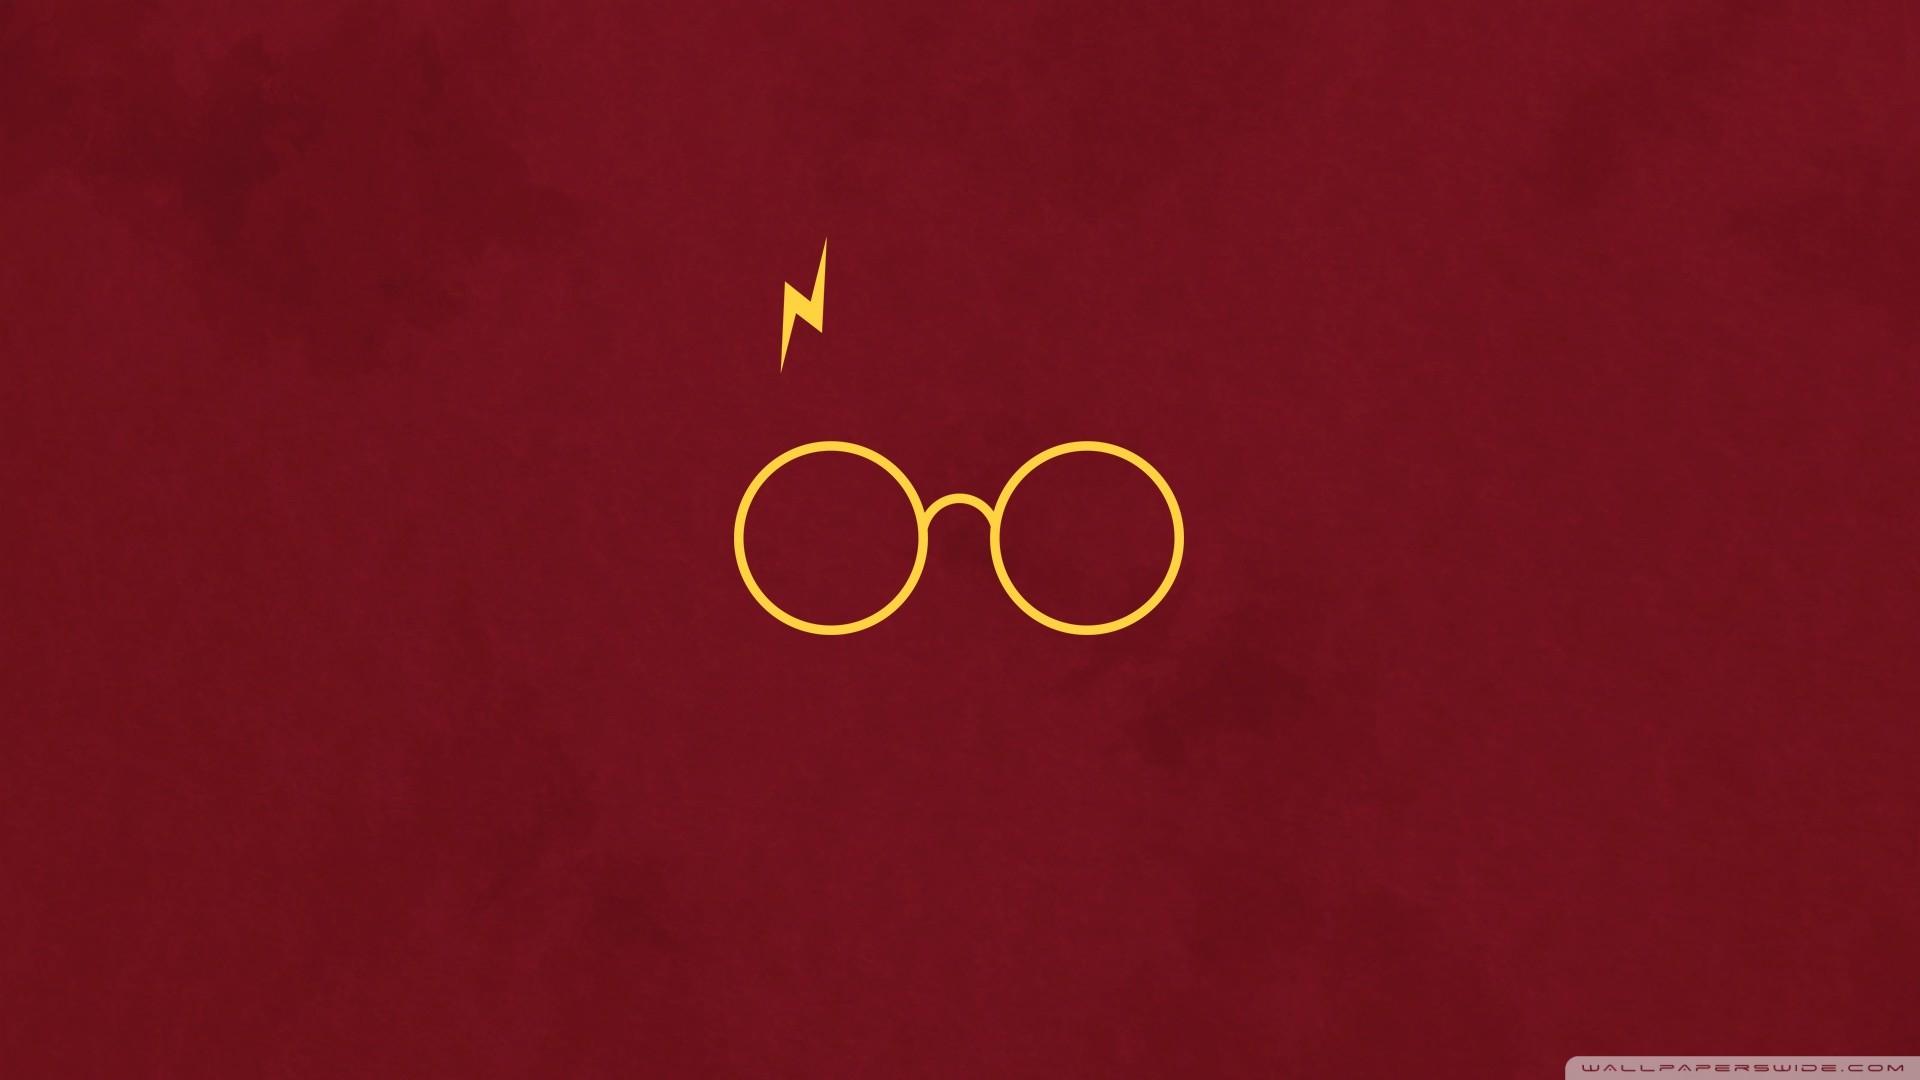 Best 25 Harry potter wallpaper ideas on Pinterest Harry